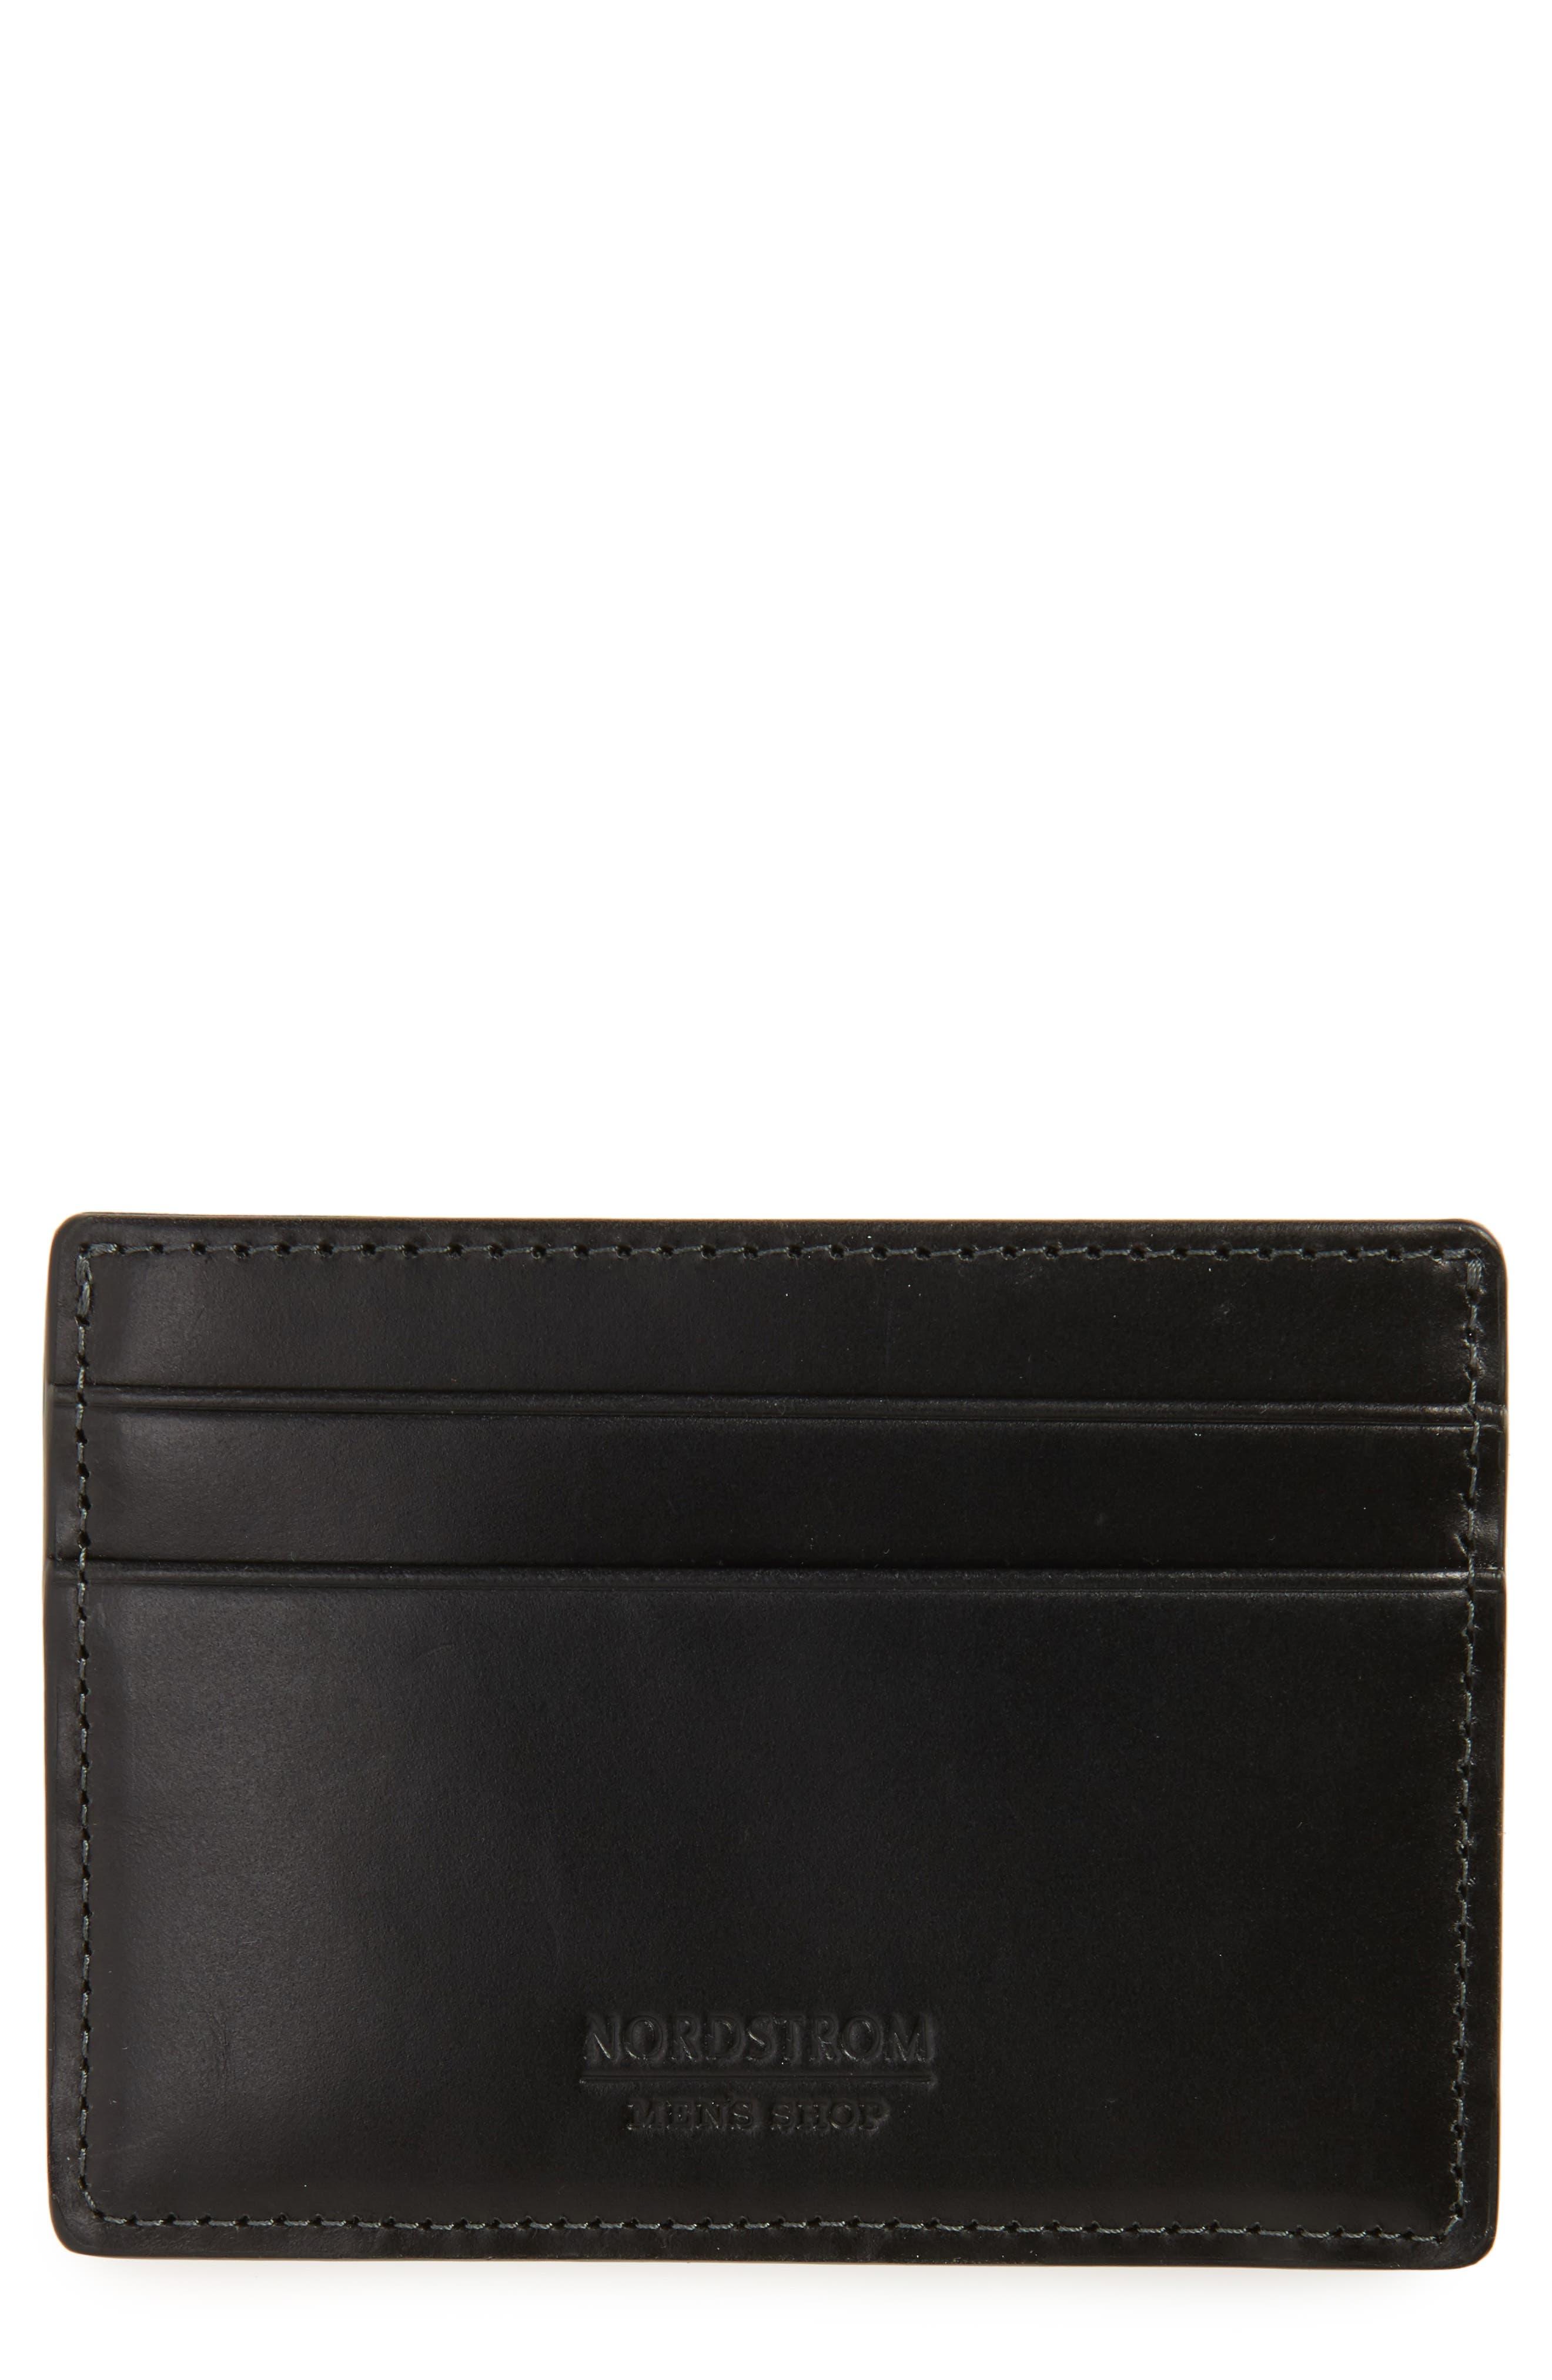 NORDSTROM MEN'S SHOP, Wyatt RFID Card Case, Main thumbnail 1, color, BLACK